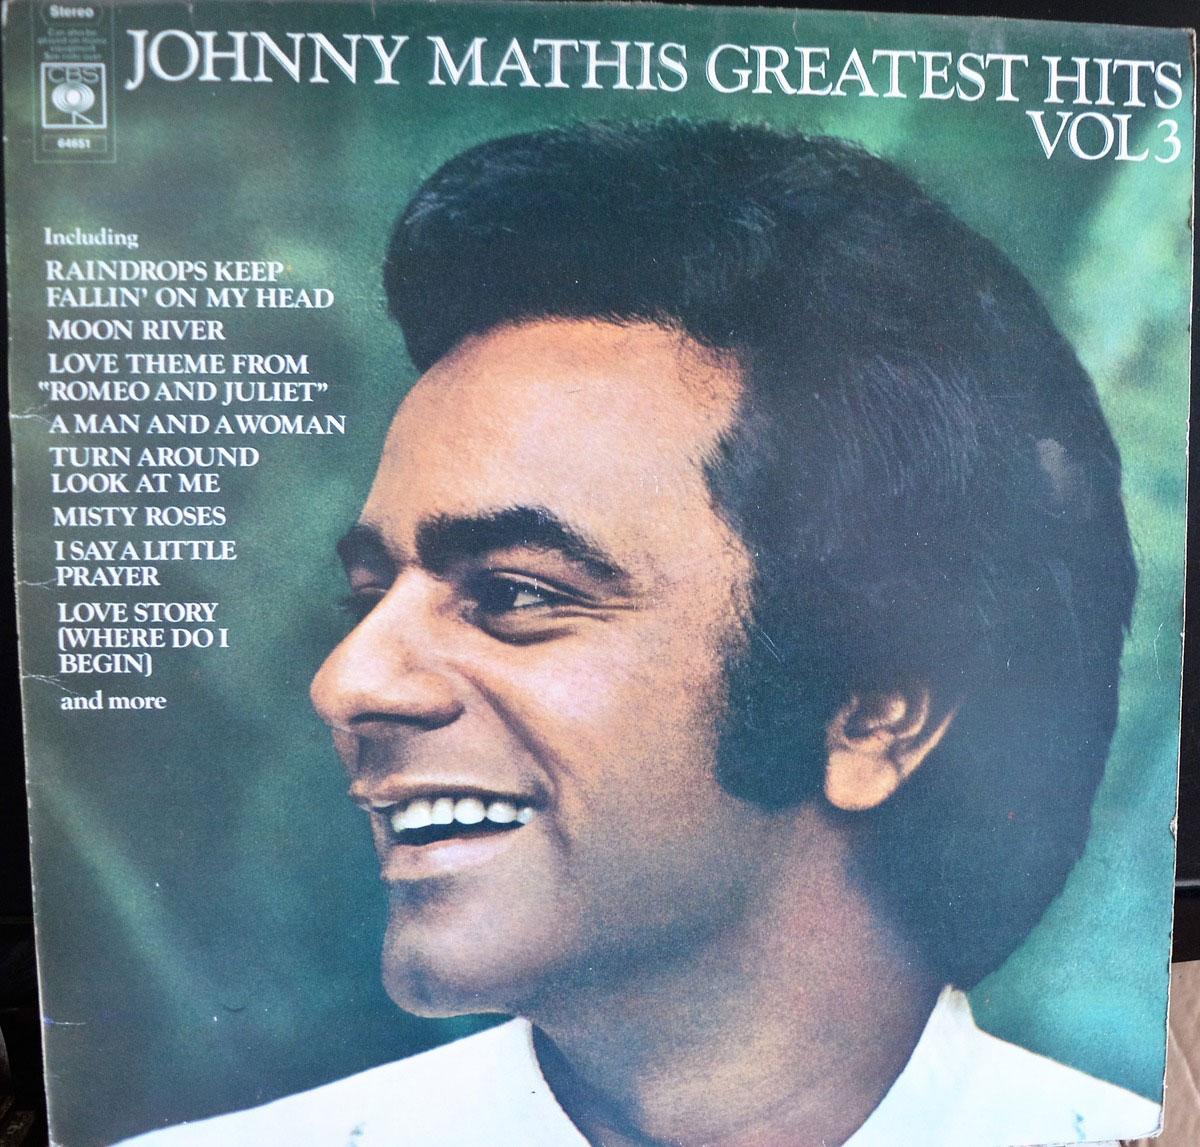 Johnny Mathis Greatest Hits Vol 3 Lp Buy From Vinylnet